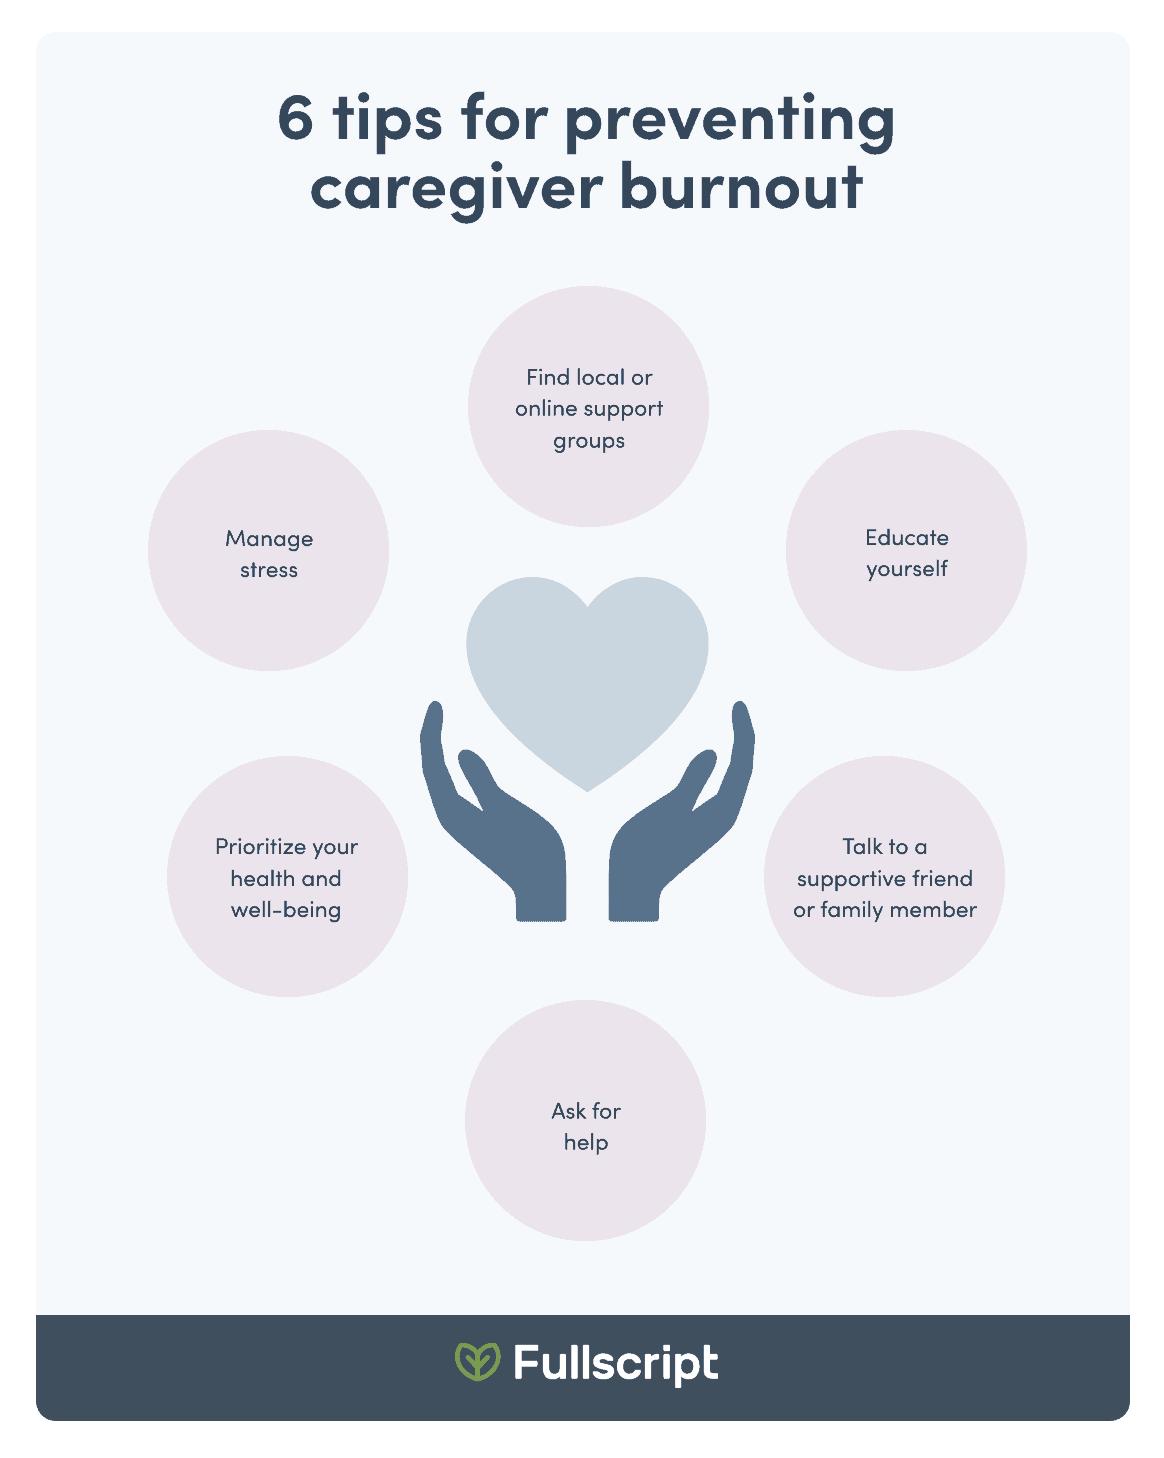 Chart showing 6 tips for preventing caregiver burnout